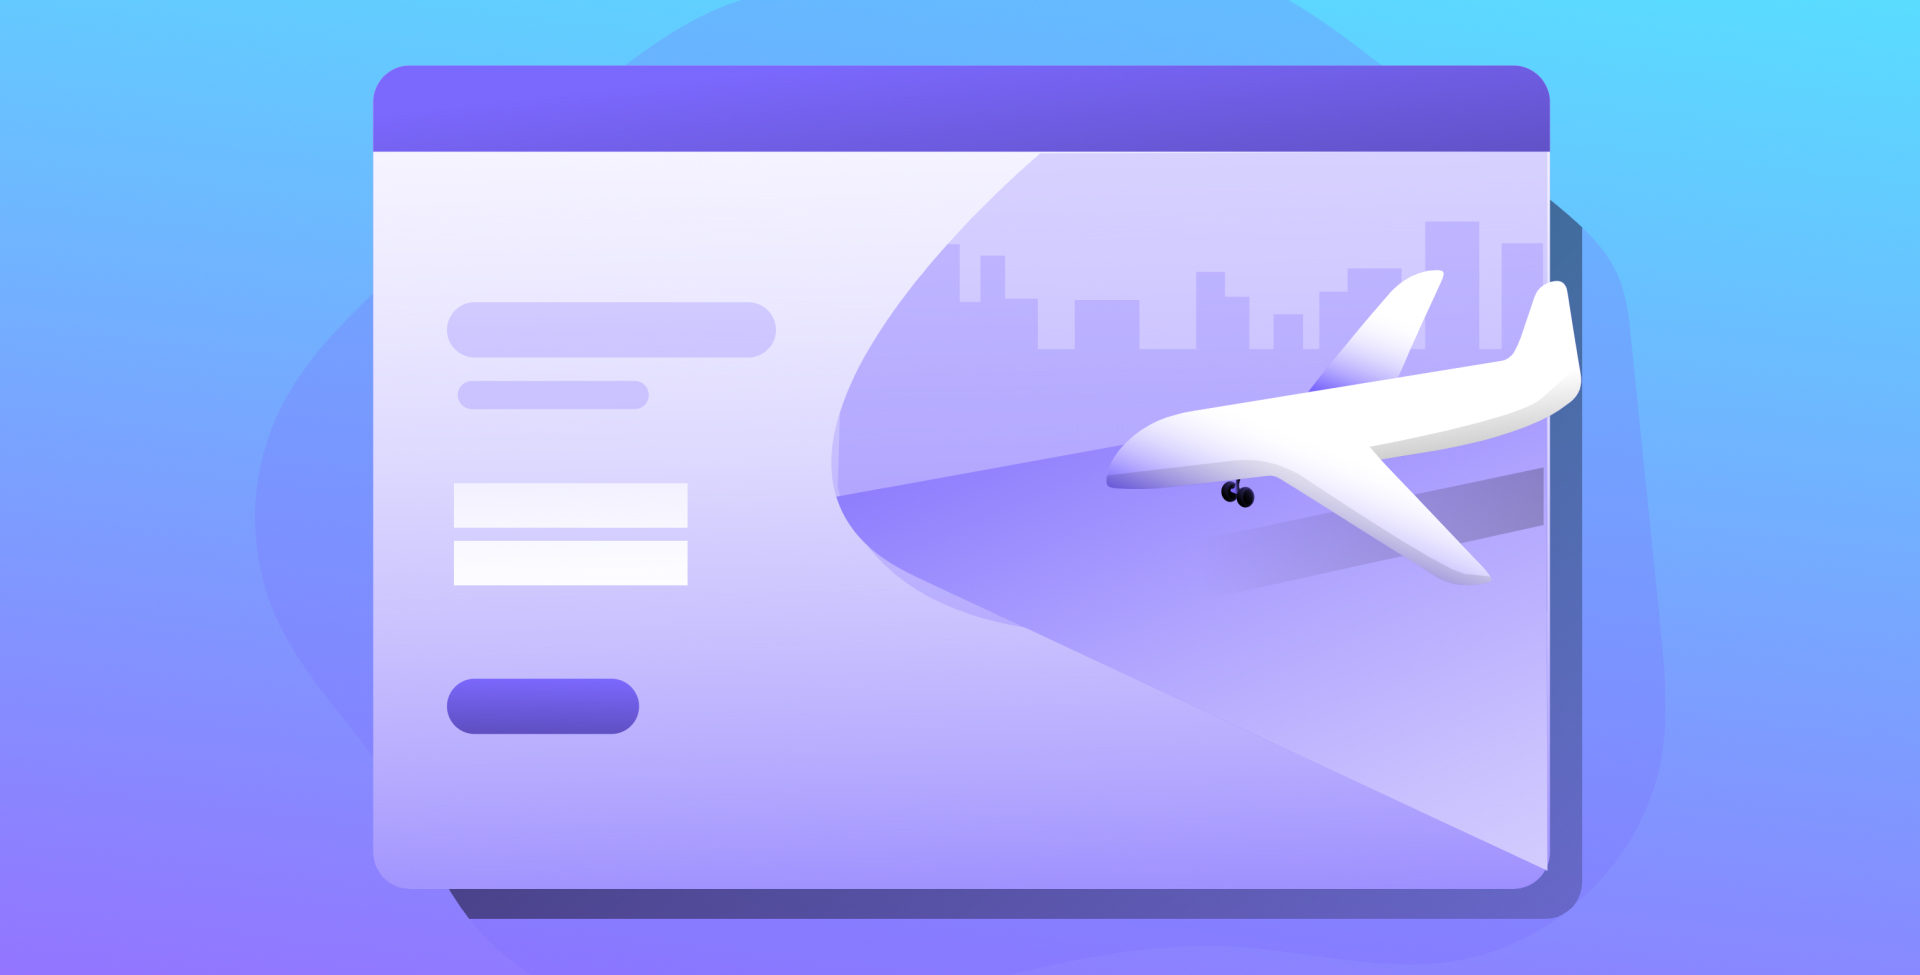 Цели и задачи сайта